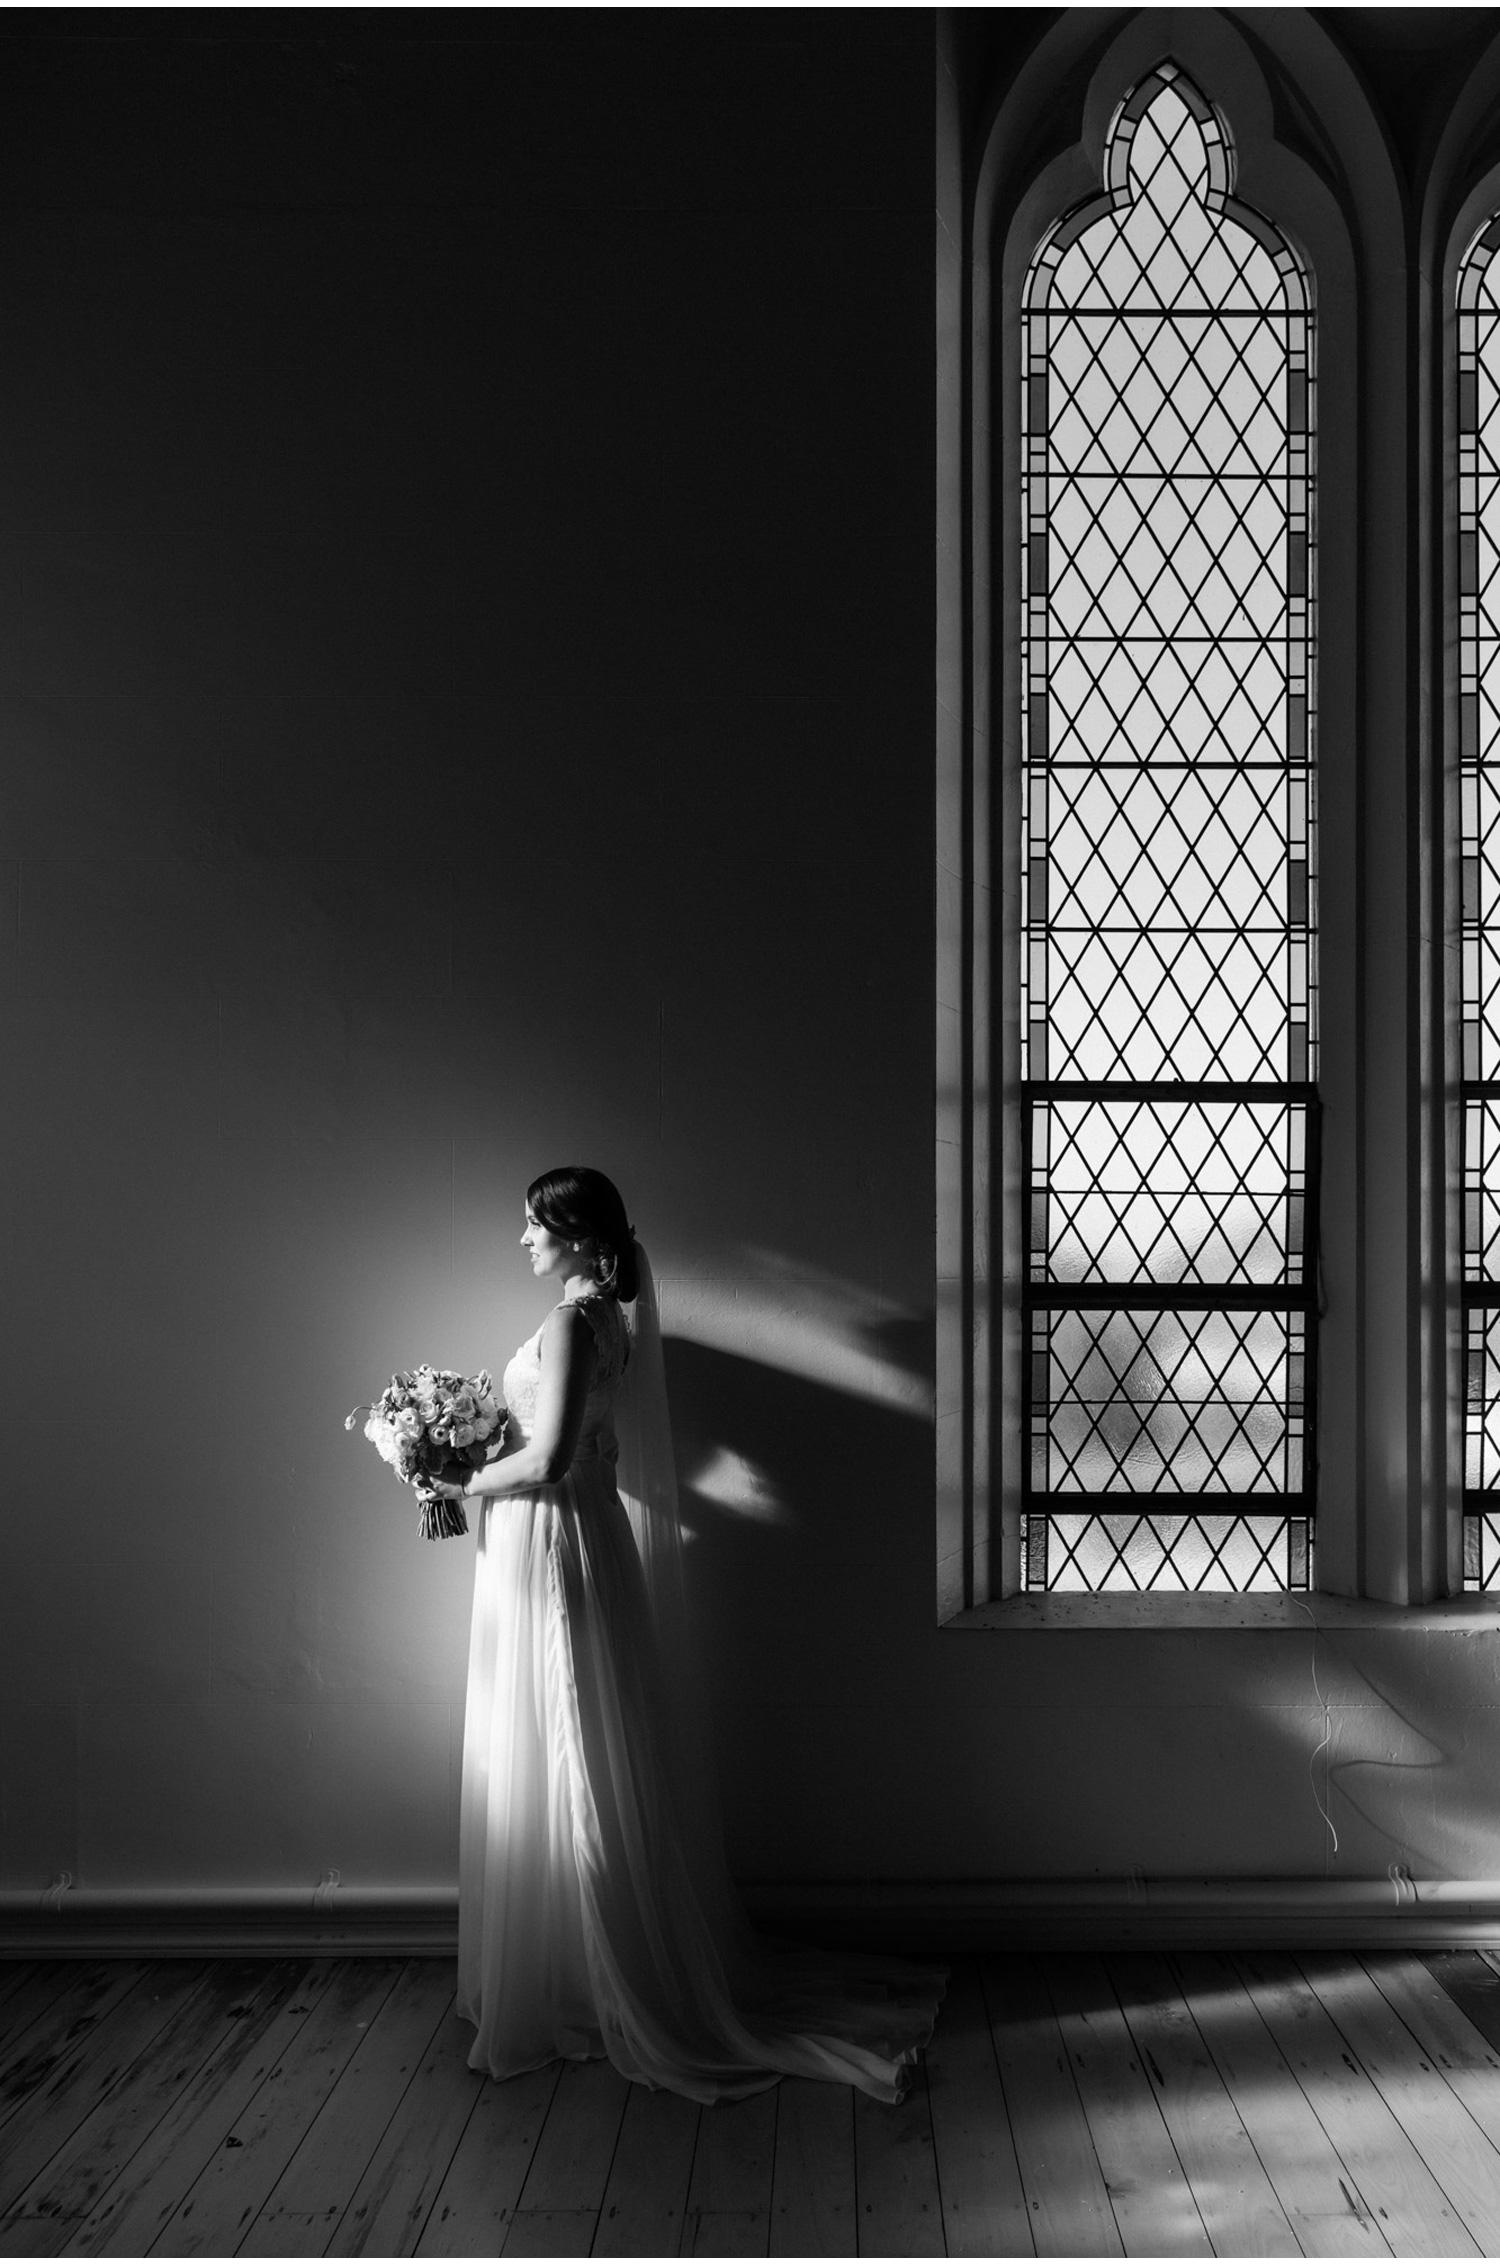 051-andrew-rankin-townsville-wedding-photography.jpg